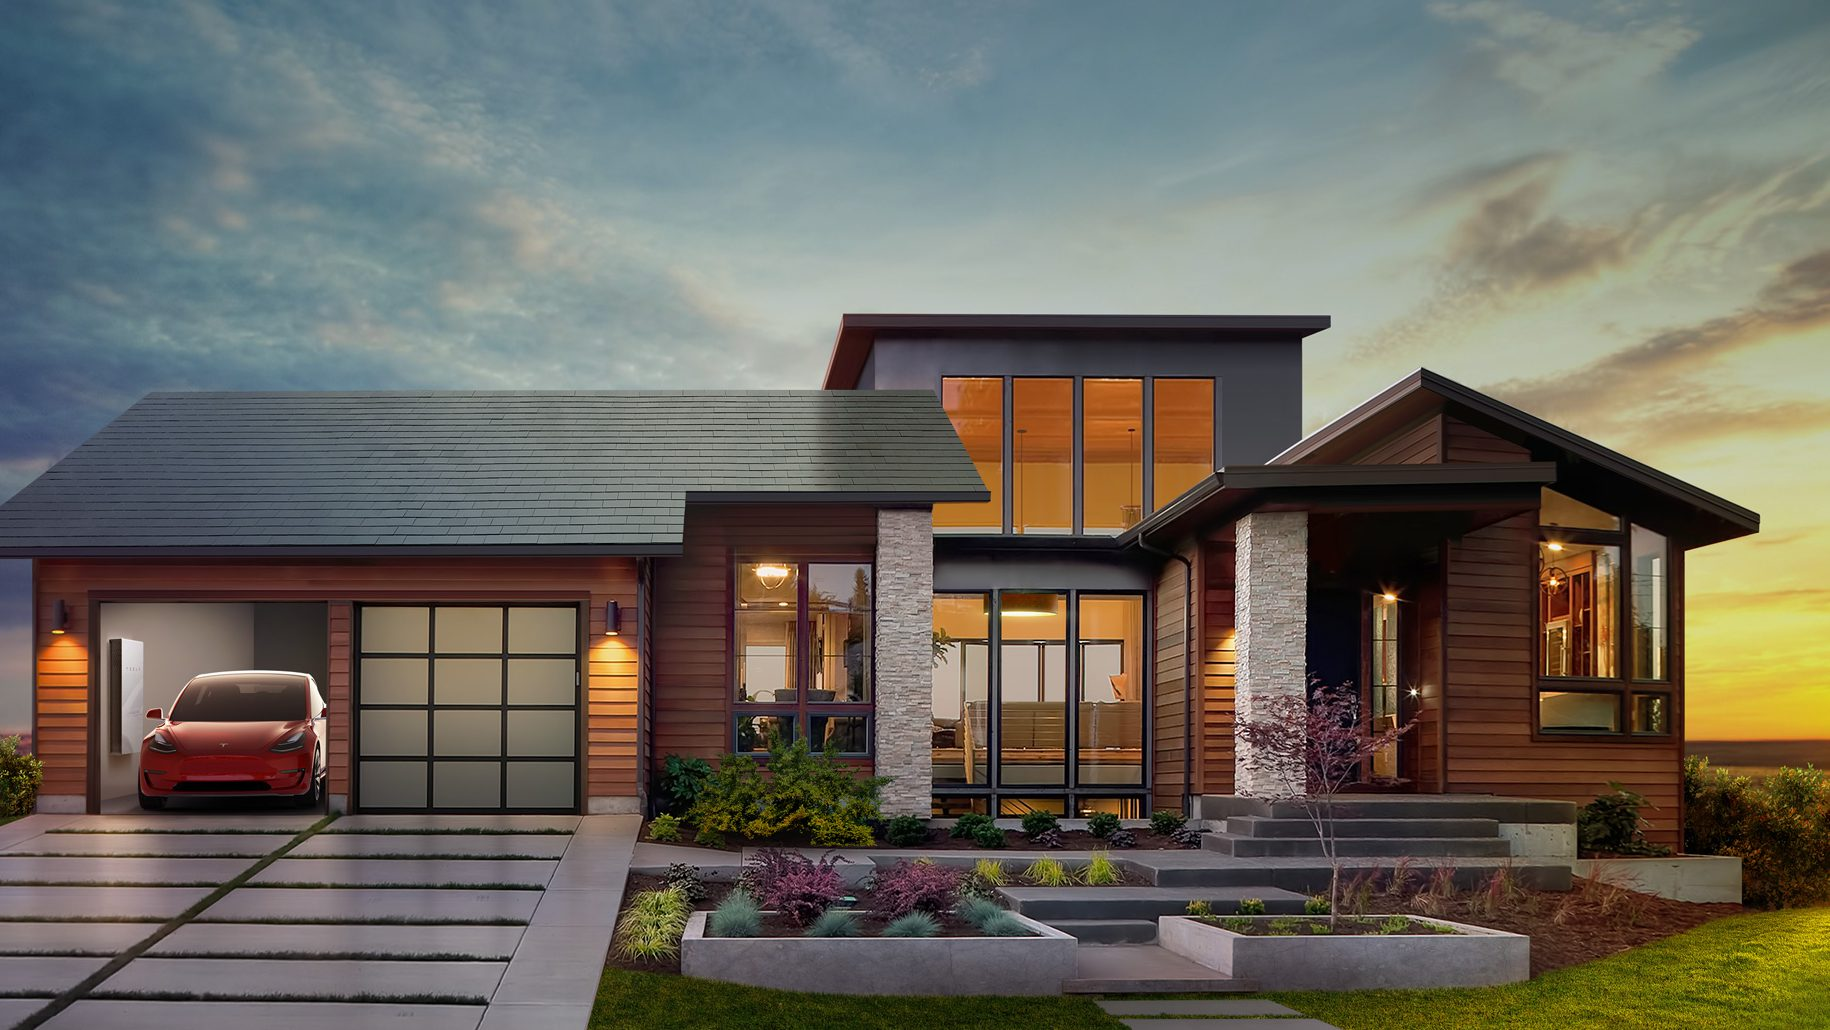 Tesla's solar roof design.